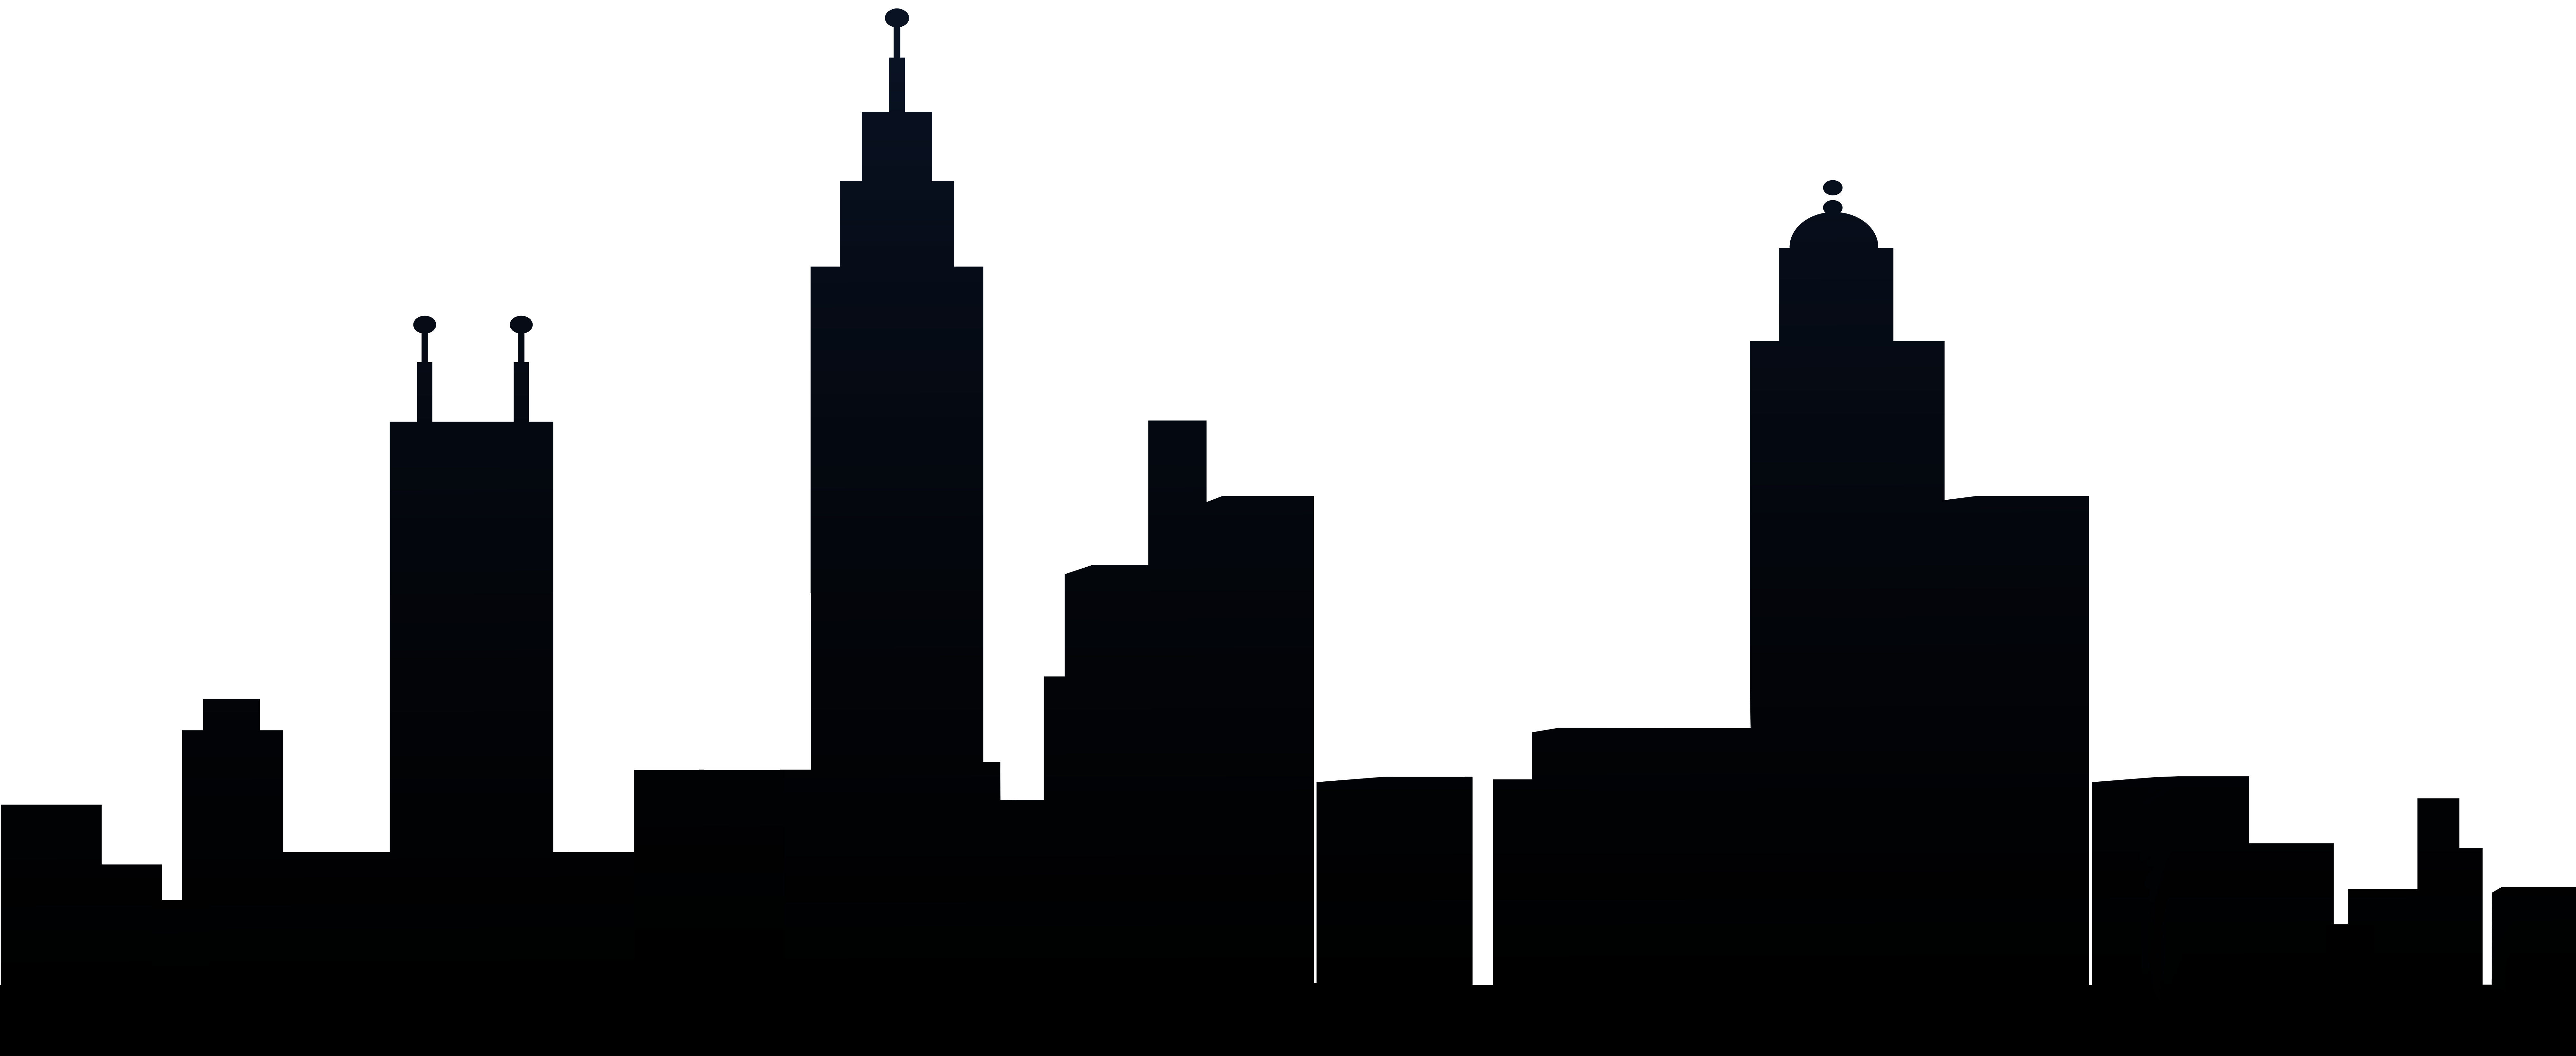 City Silhouette PNG Clip Art Image.